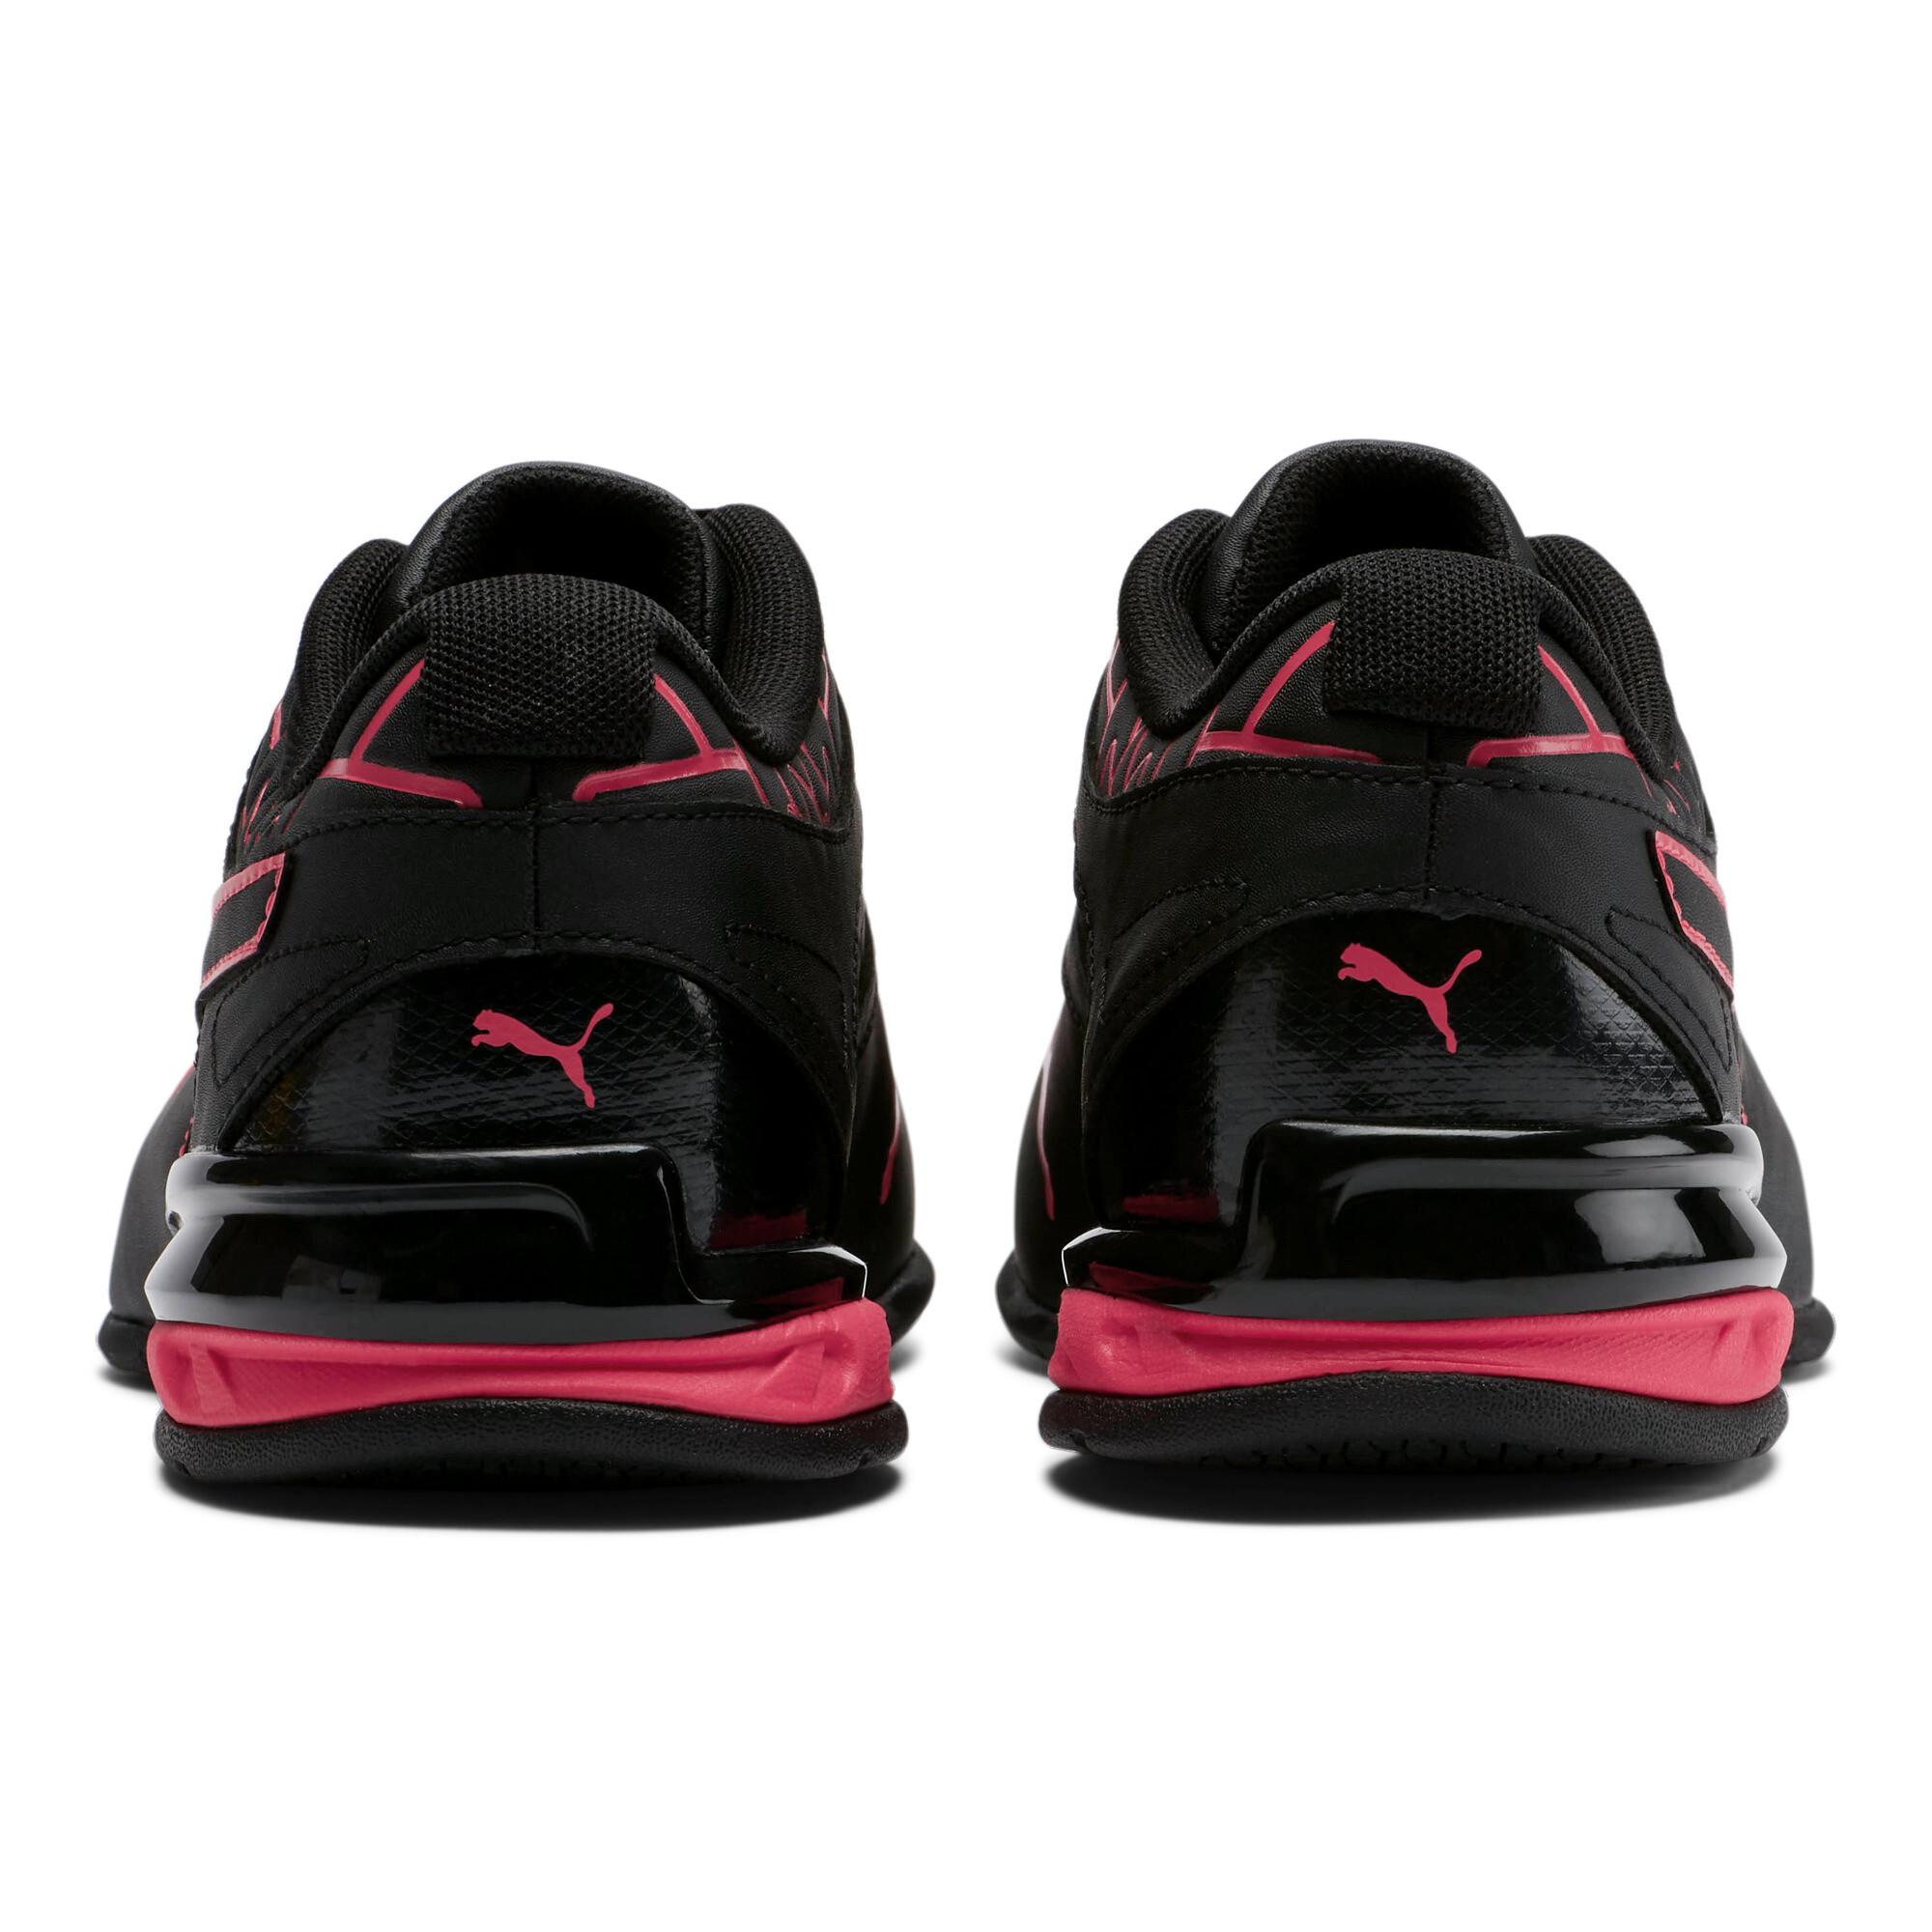 thumbnail 8 - PUMA Women's Tazon 6 Graphic Sneakers